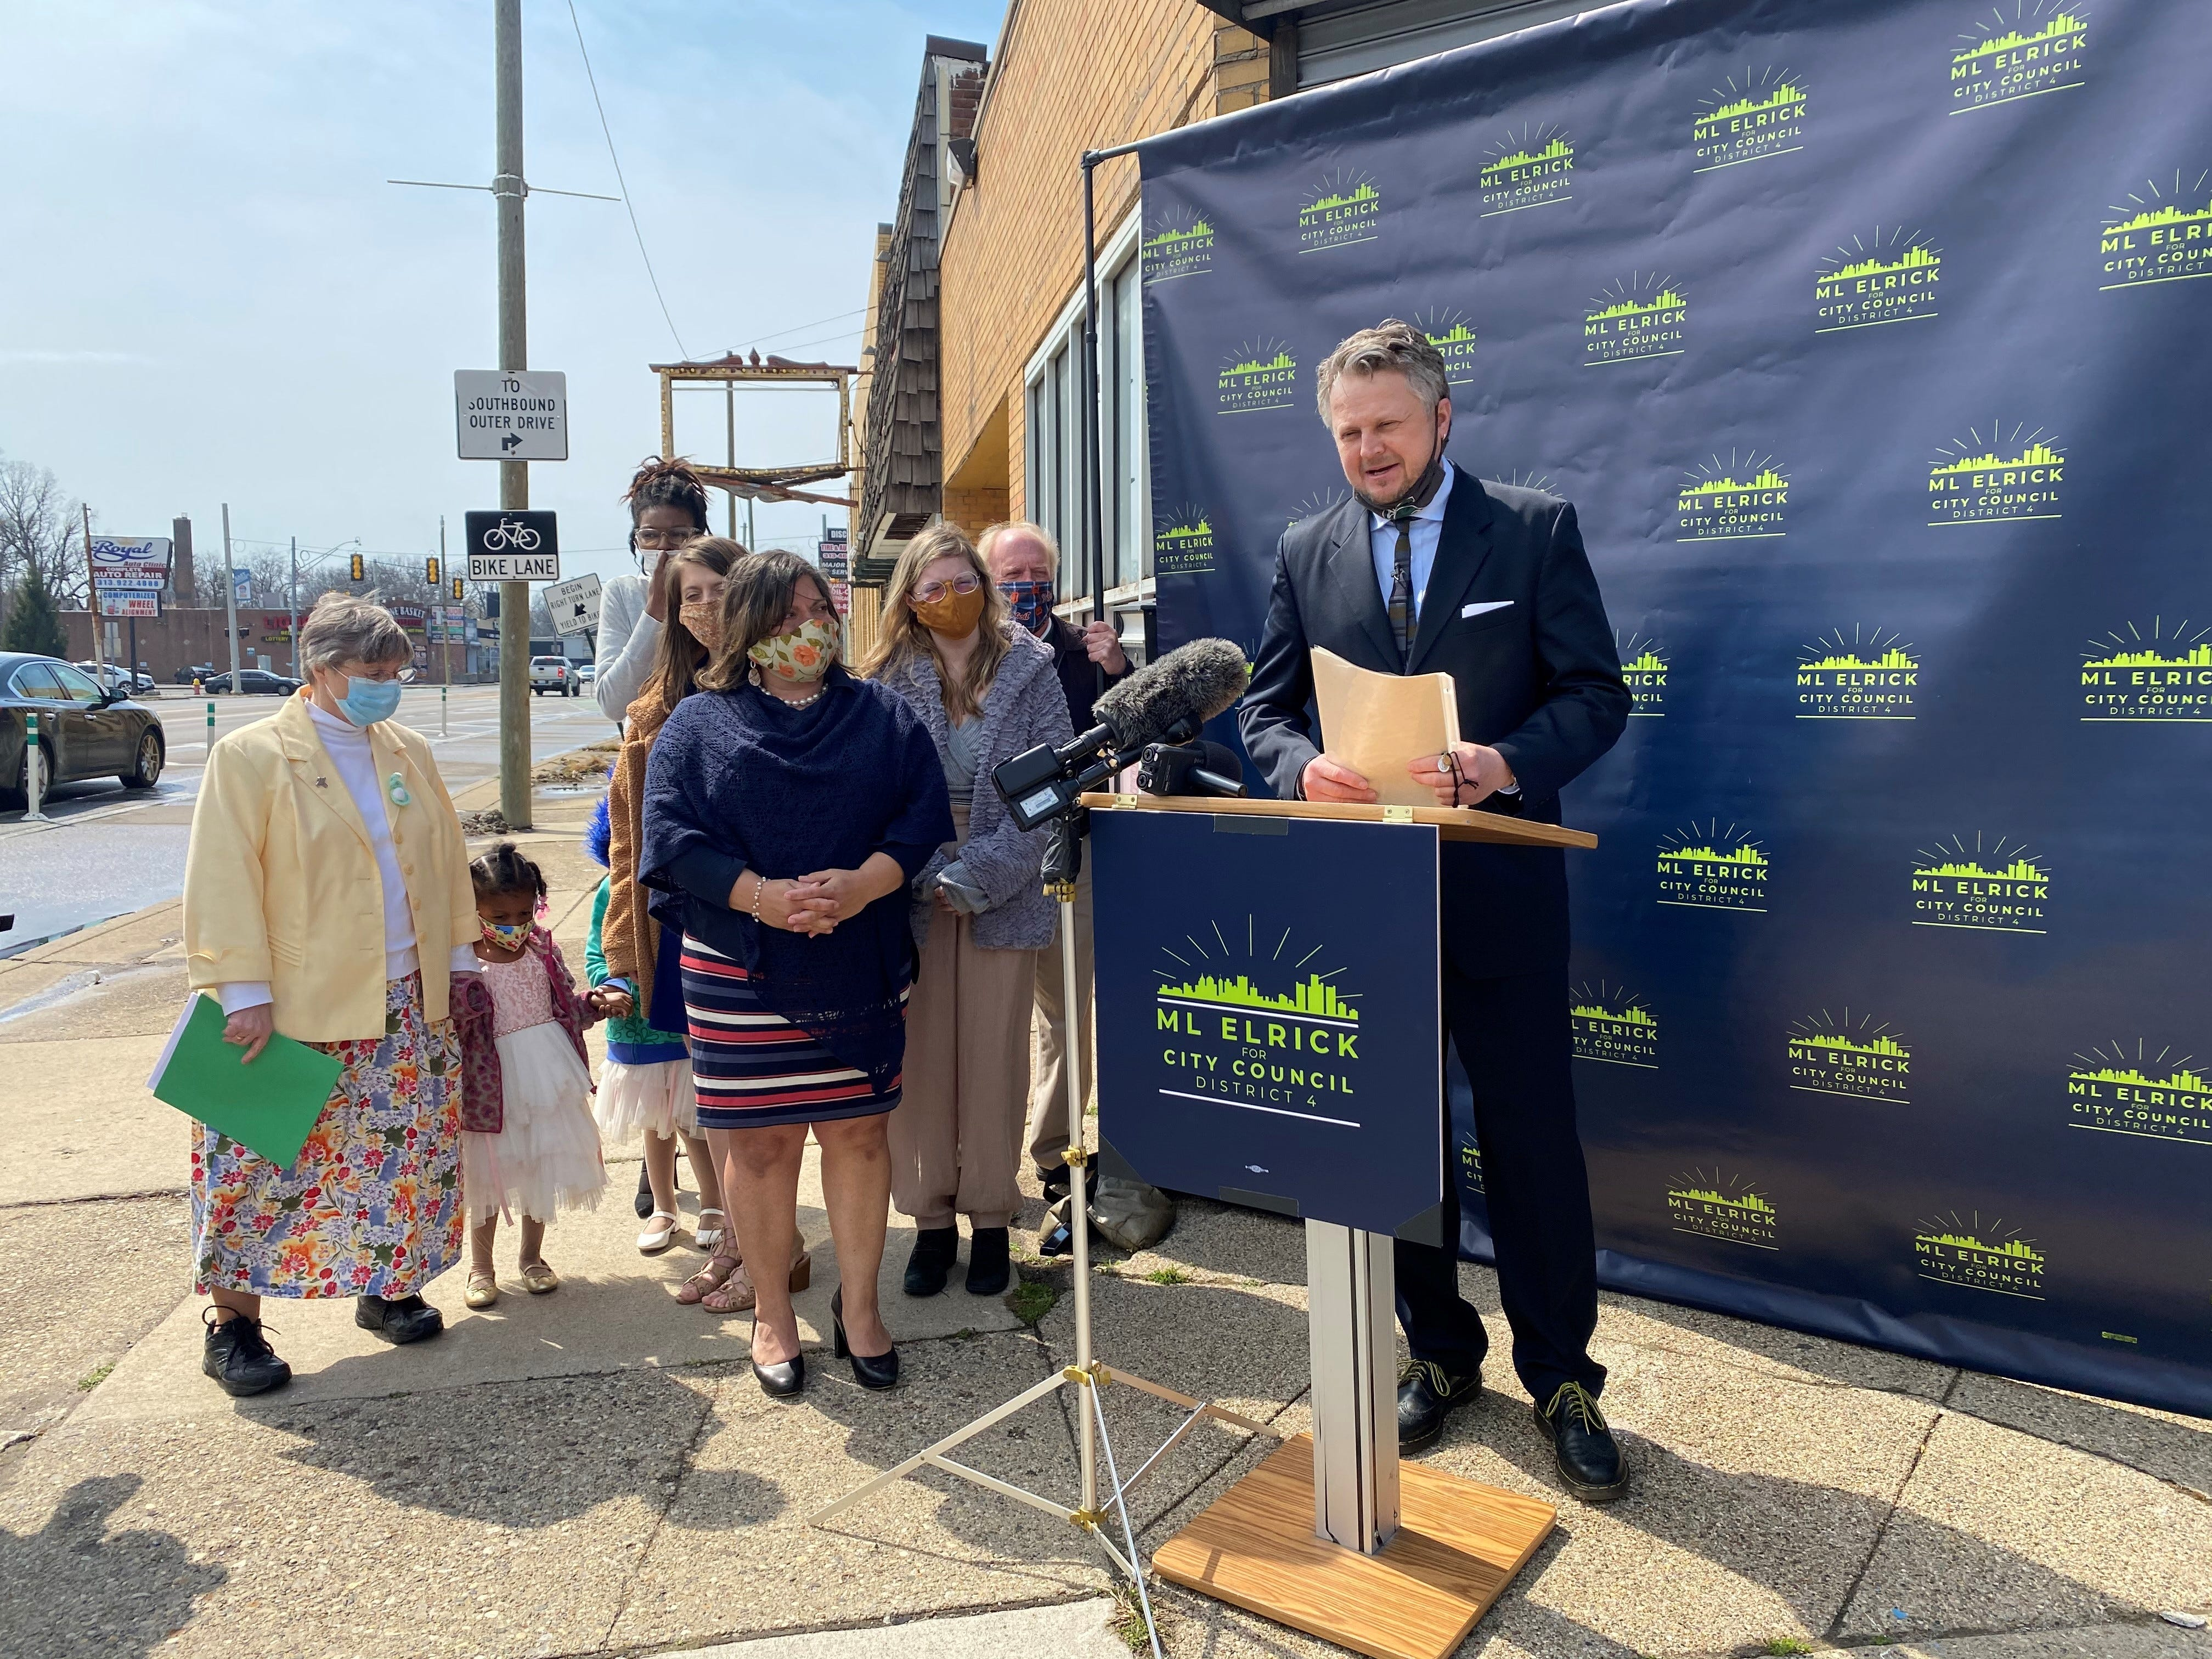 Detroit City Council candidate calls for ethics overhaul